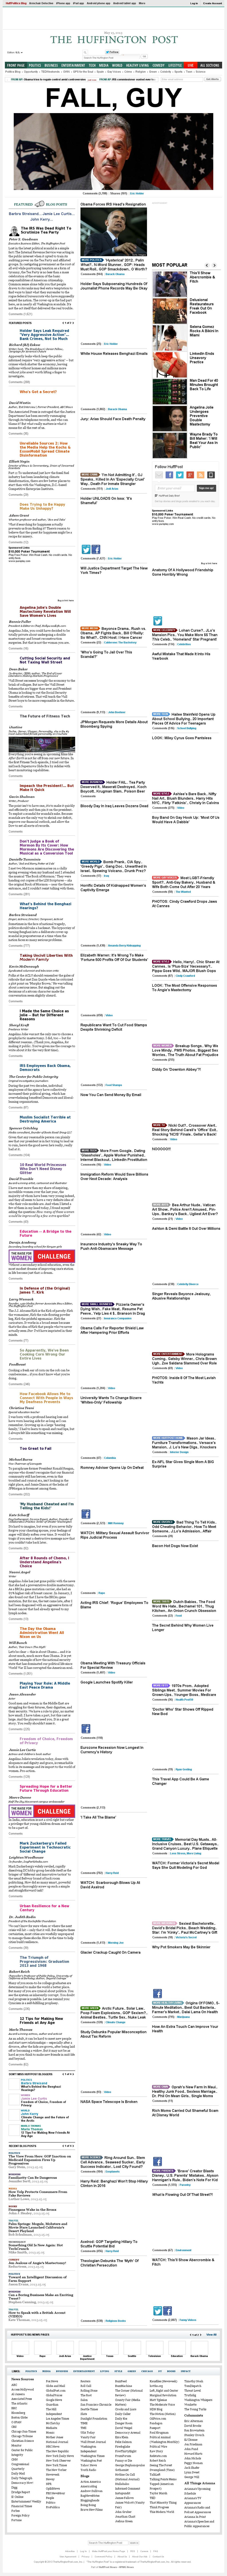 The Huffington Post at Wednesday May 15, 2013, 11:10 p.m. UTC